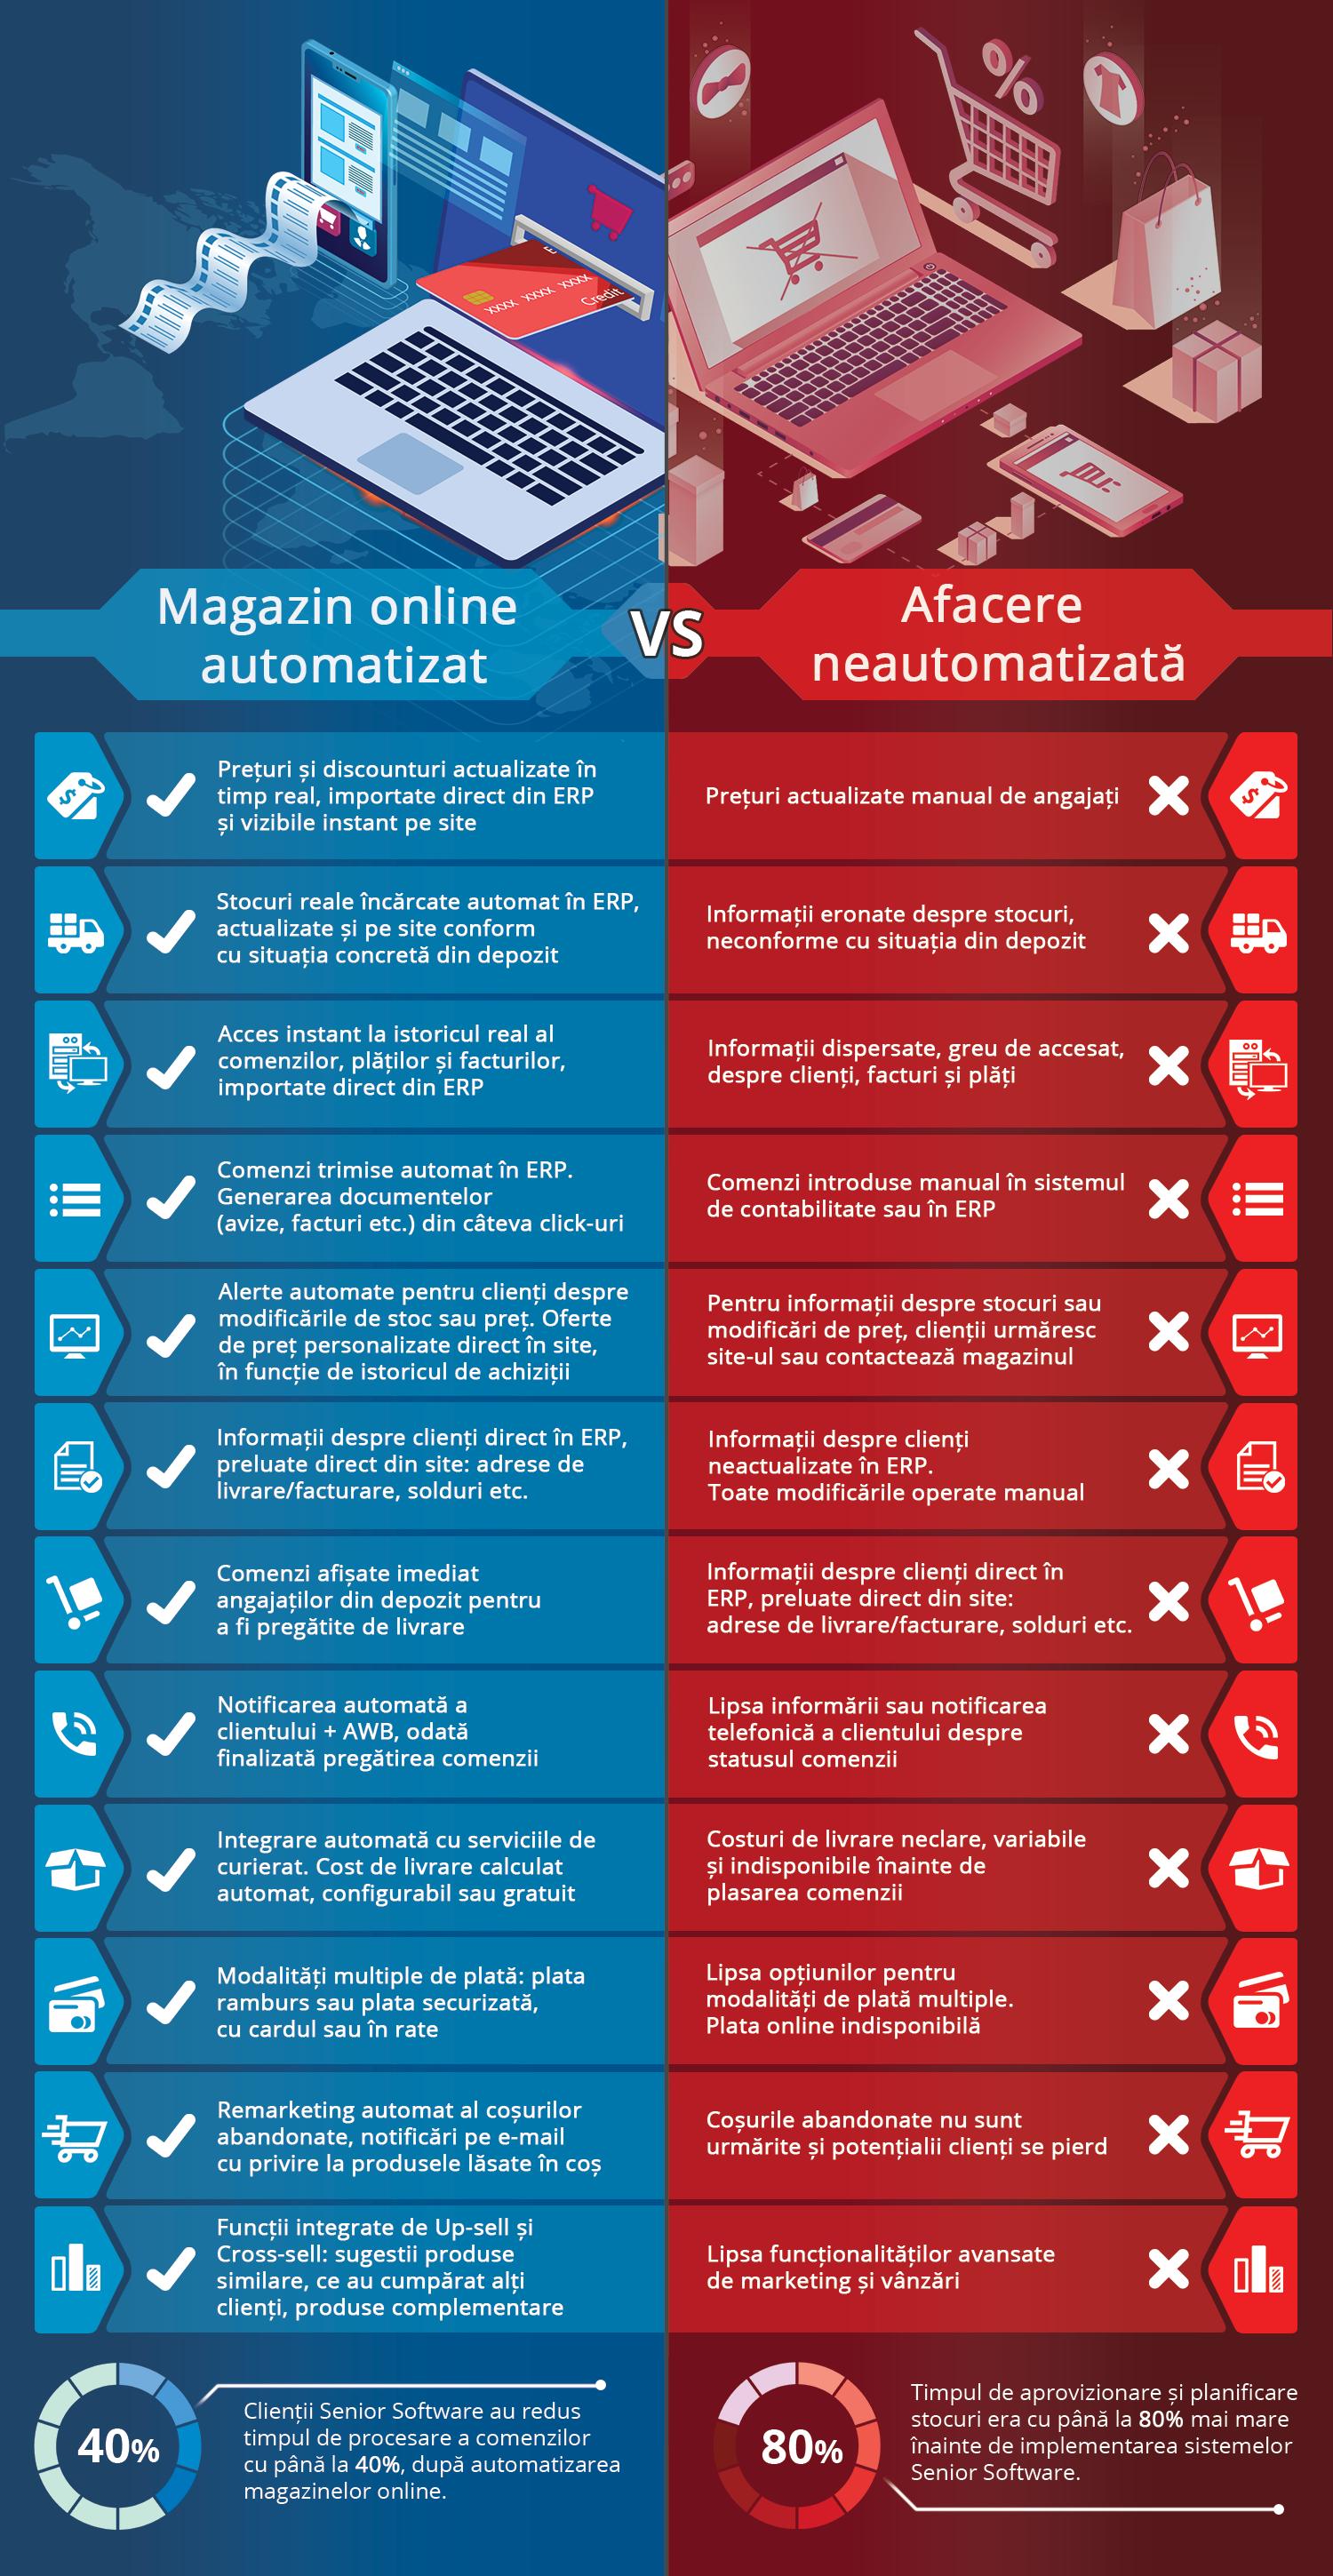 Infografic - magazin online automatizat versus o afacere neautomatizata